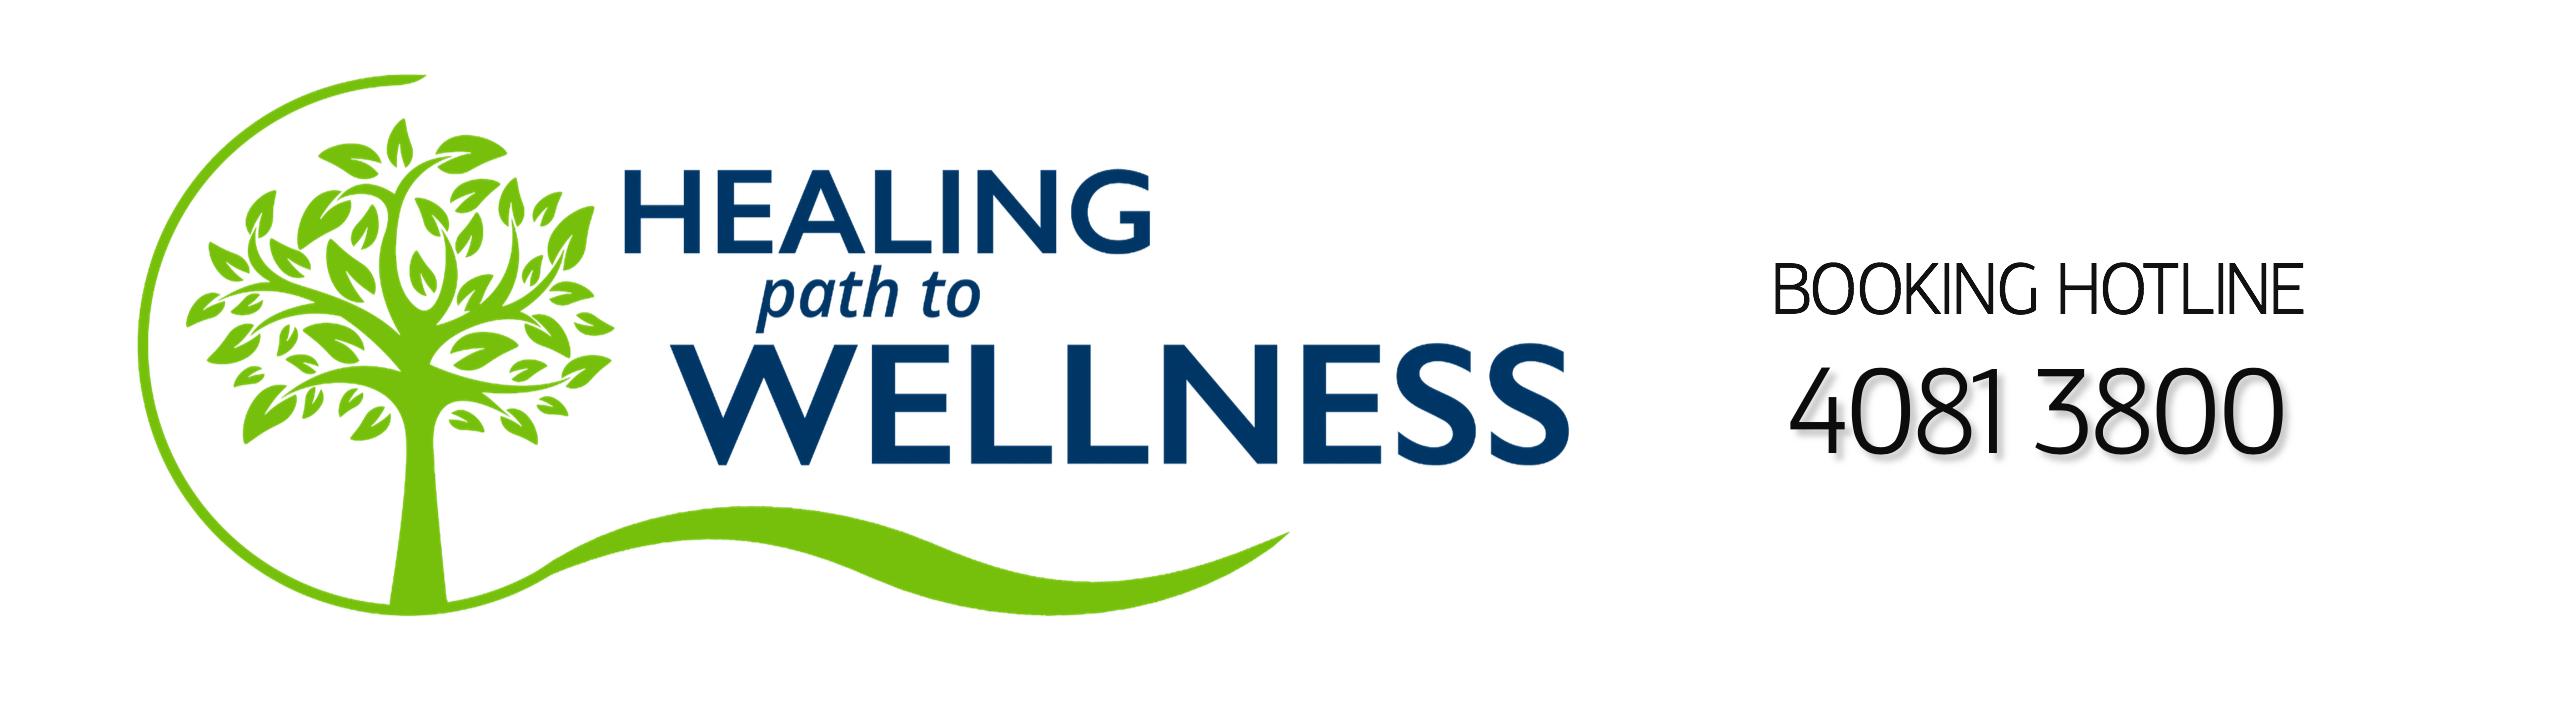 HEALING PATH TO WELLNESS